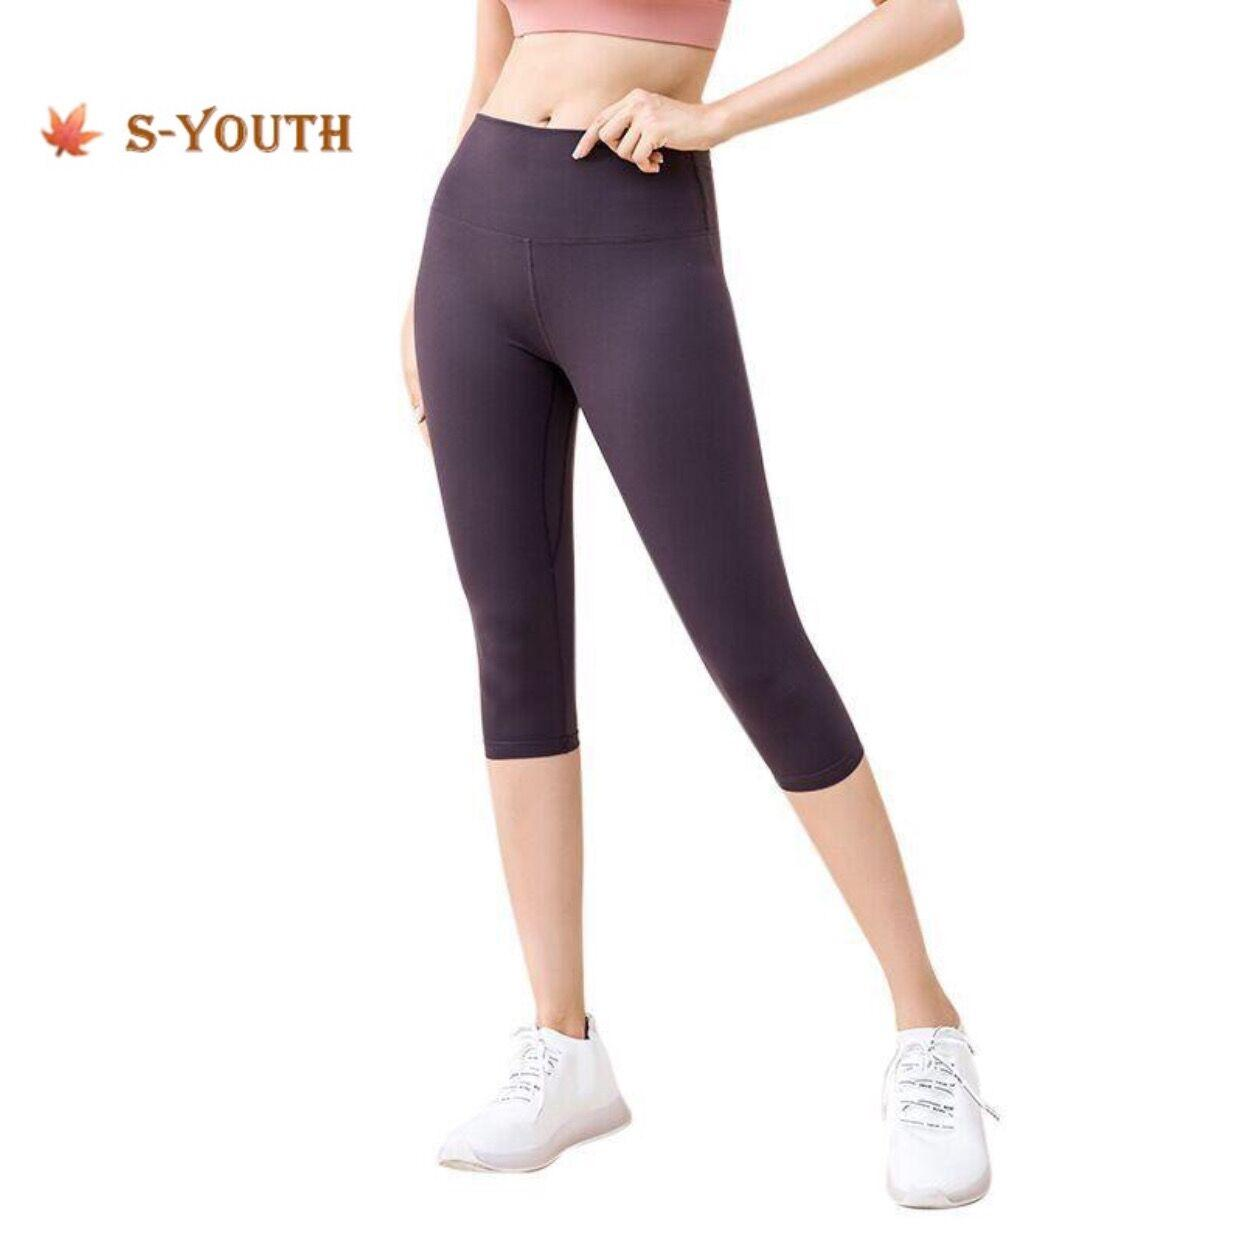 2020 Summer High Waist Sanding Nude Yoga Pants Women Hip Lifting Exercise Fast Drying Fitness Pants Tight Pants